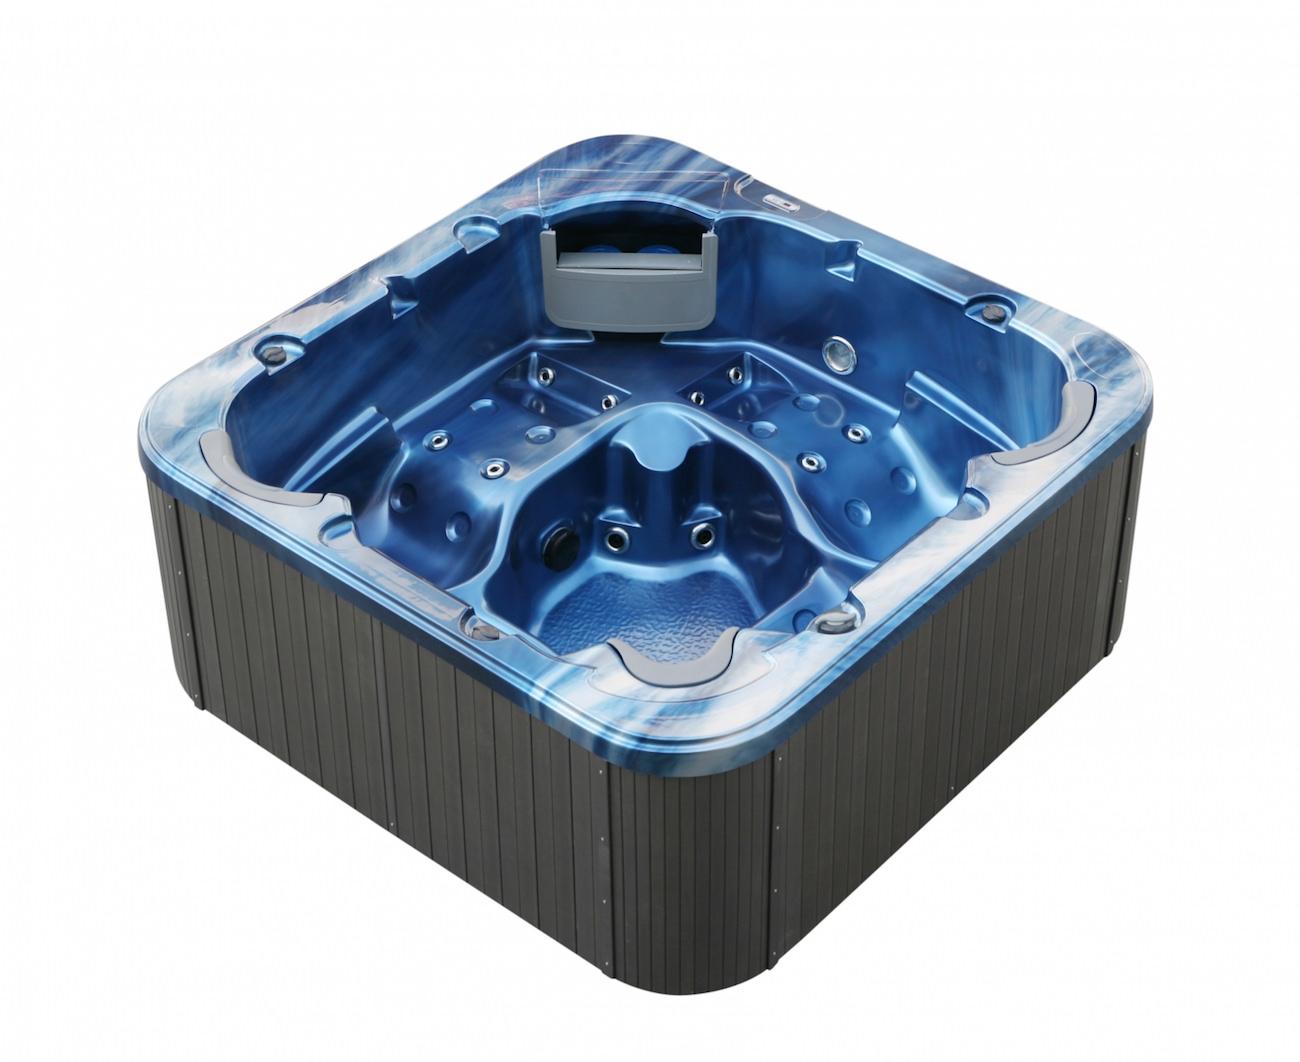 American Outdoor-Whirlpool Torina ozean blau - grau / 215 x 215